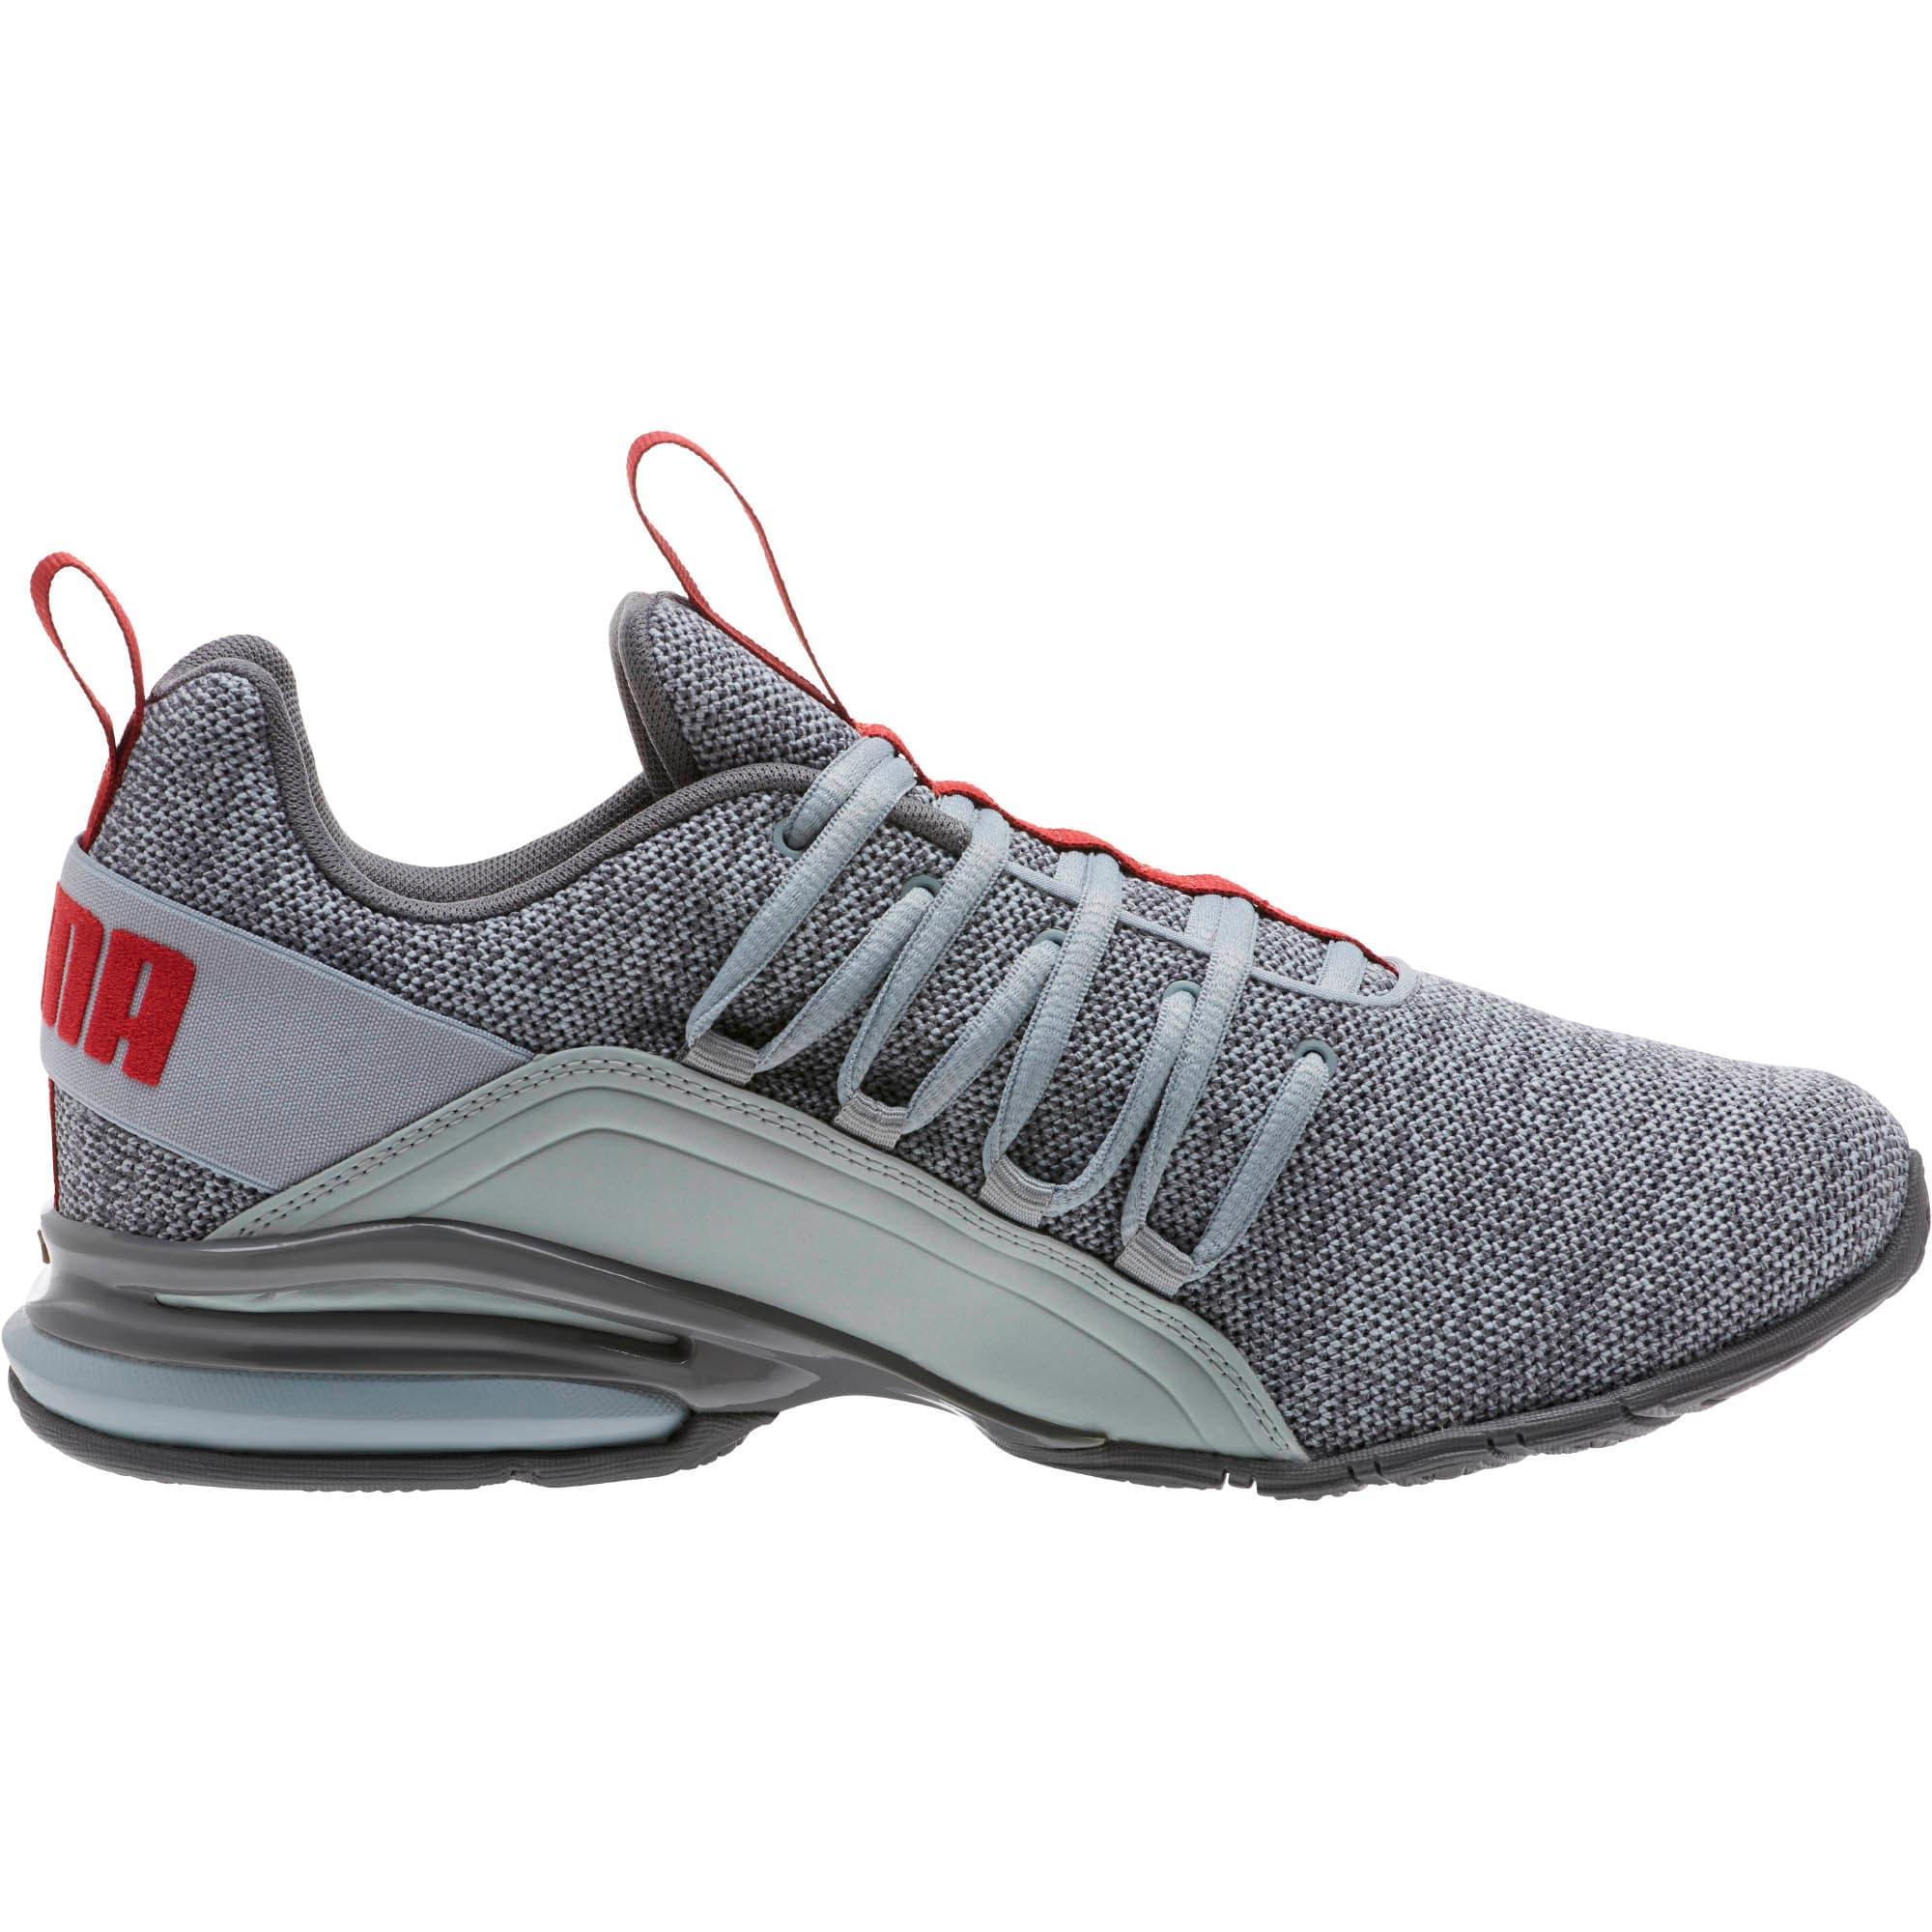 Thumbnail 3 of Axelion Men's Training Shoes, Quarry-QUIET SHADE-Red, medium